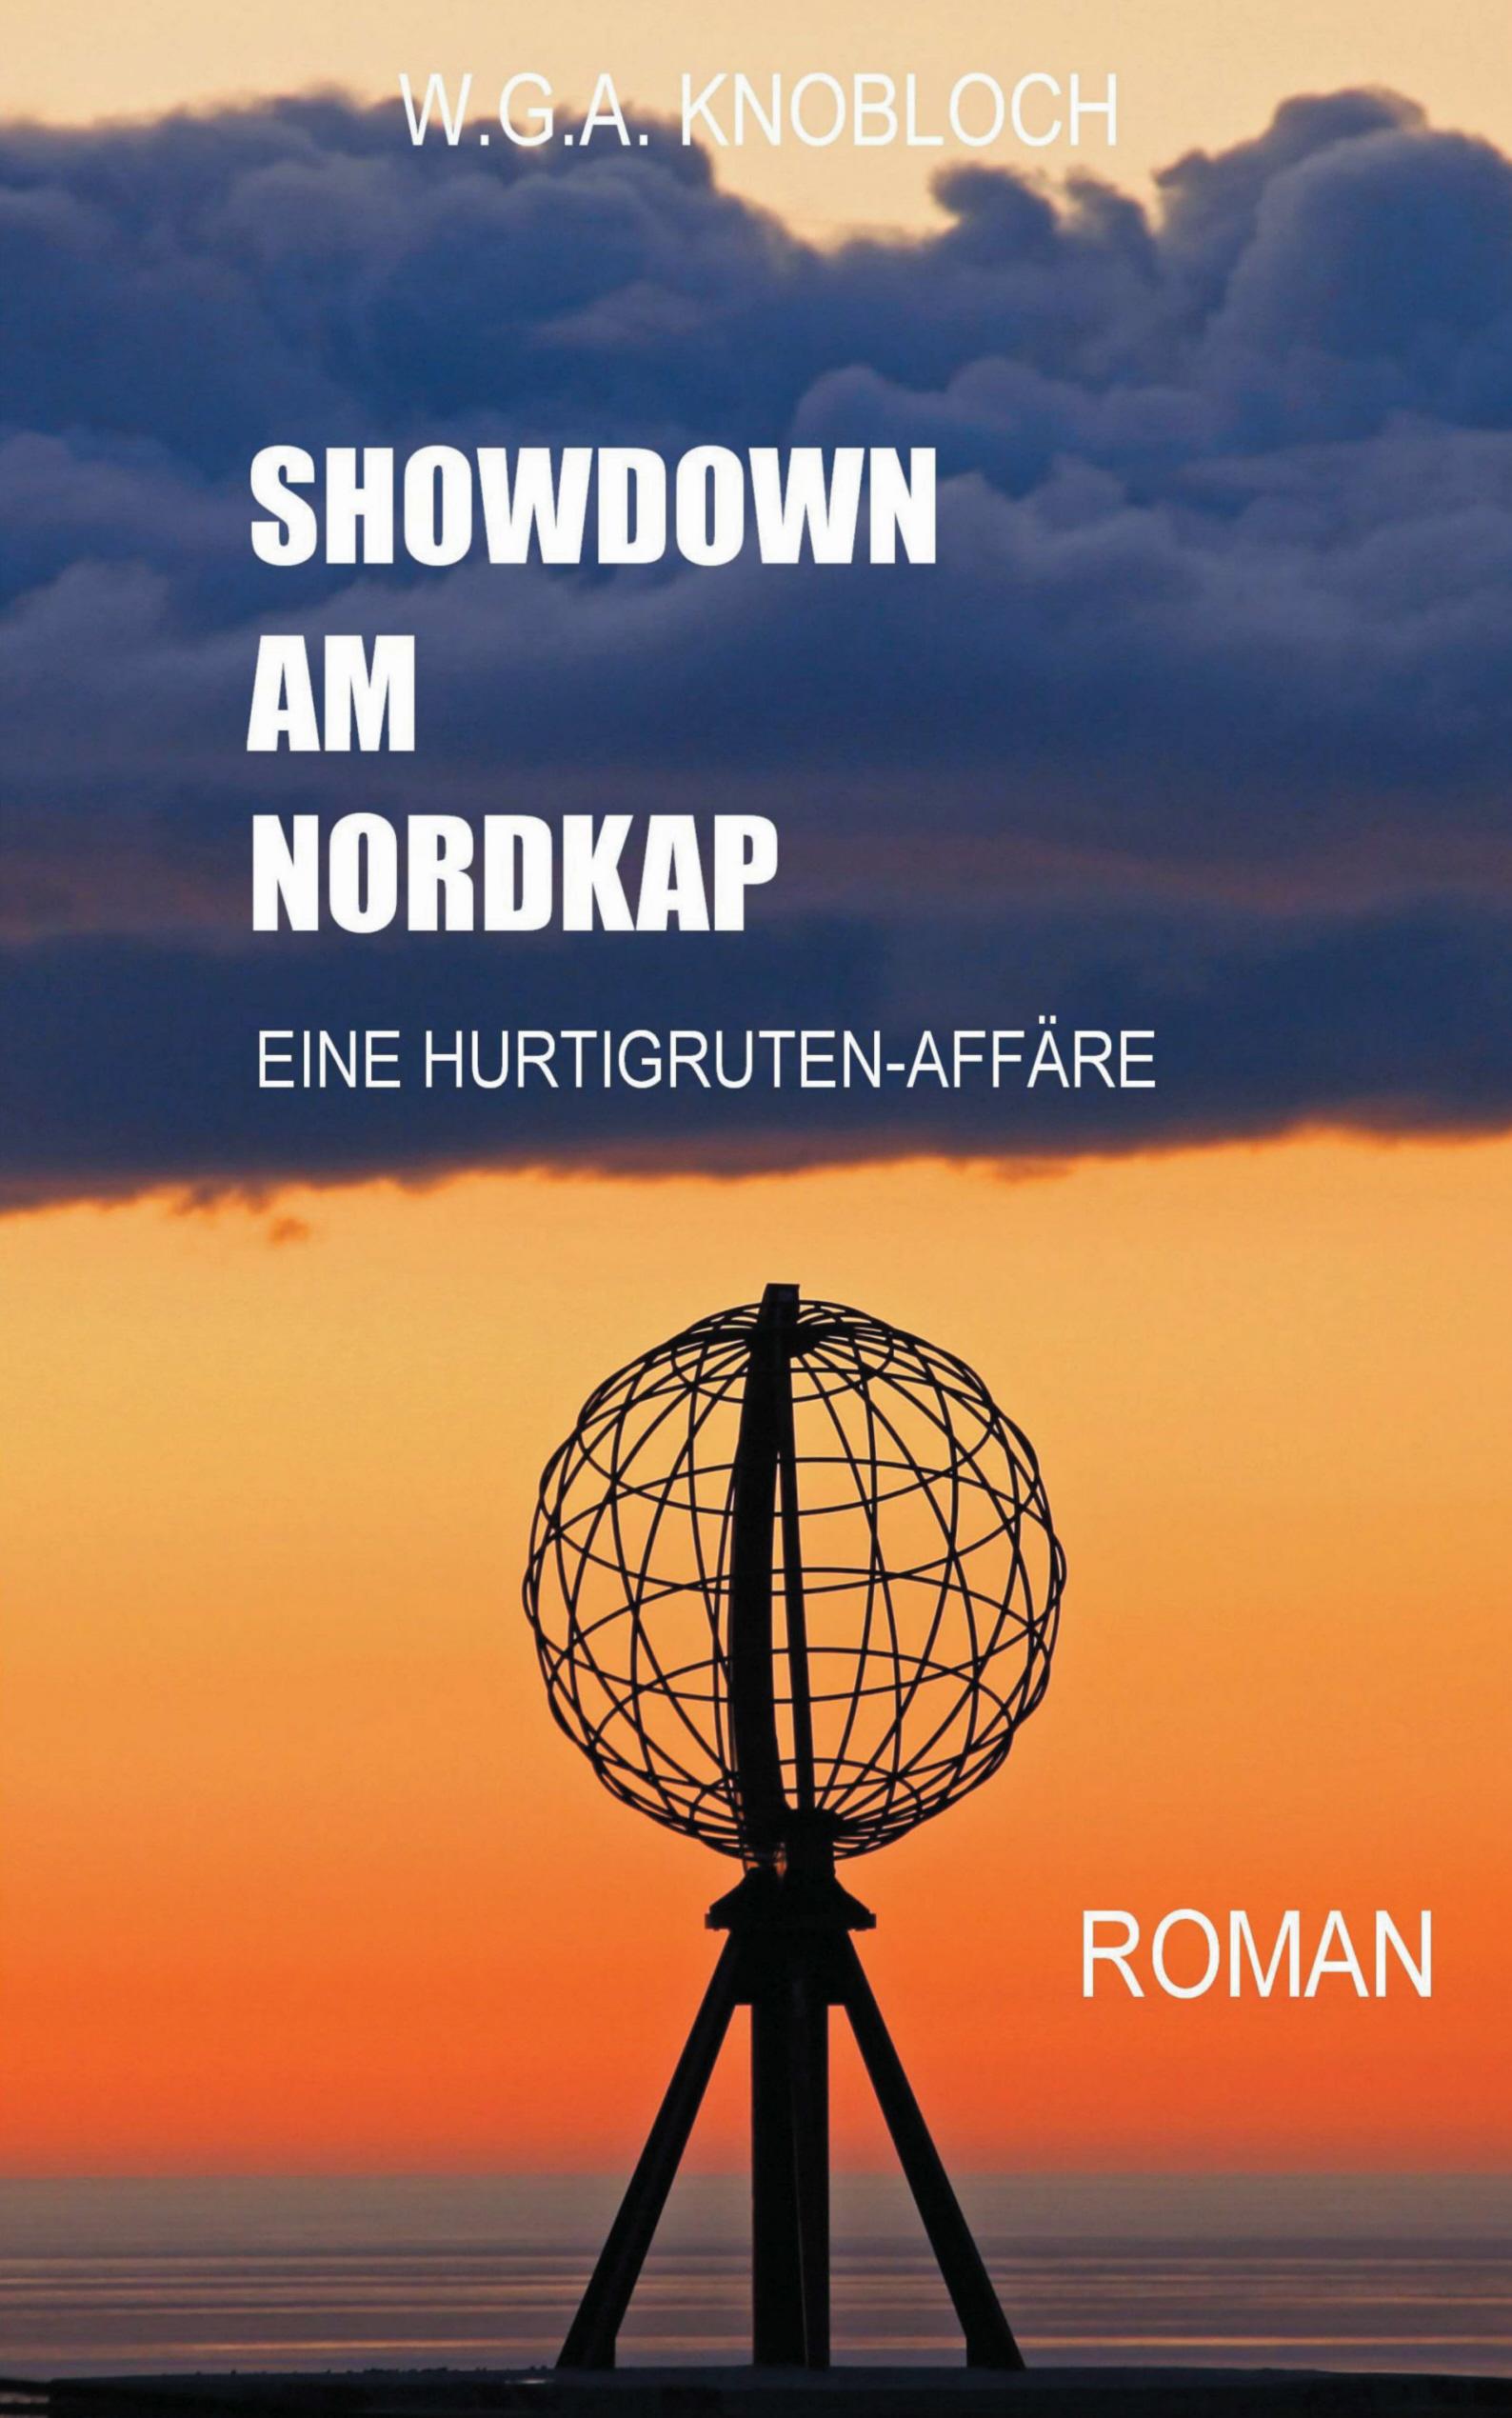 Showdown am Nordkap